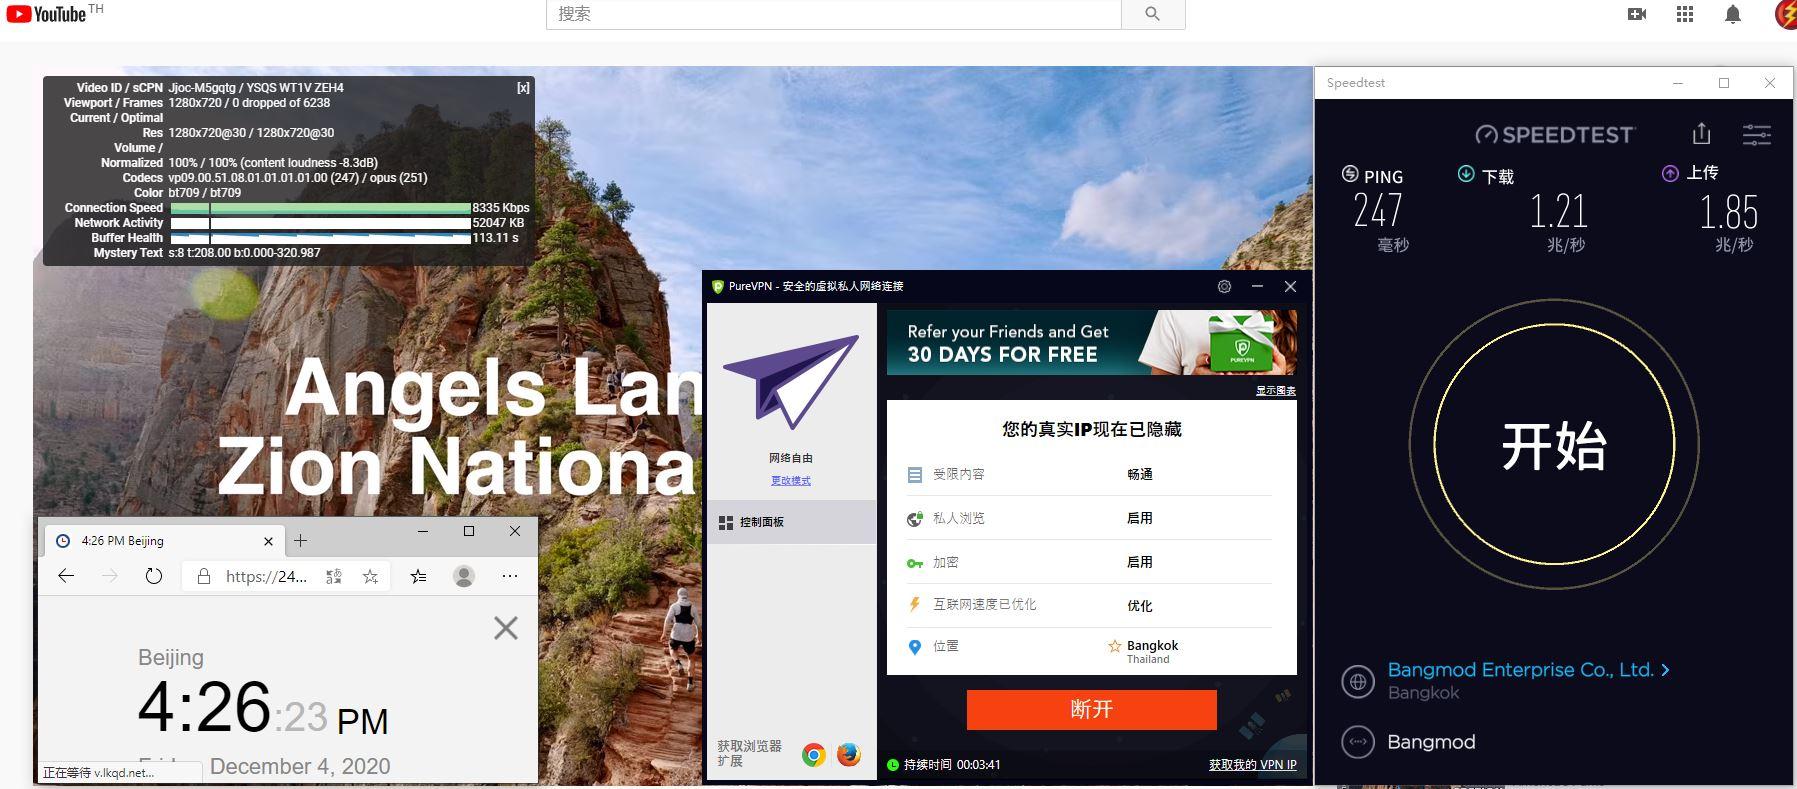 Windows10 PureVPN Thailand 服务器 中国VPN 翻墙 科学上网 测试 - 20201204